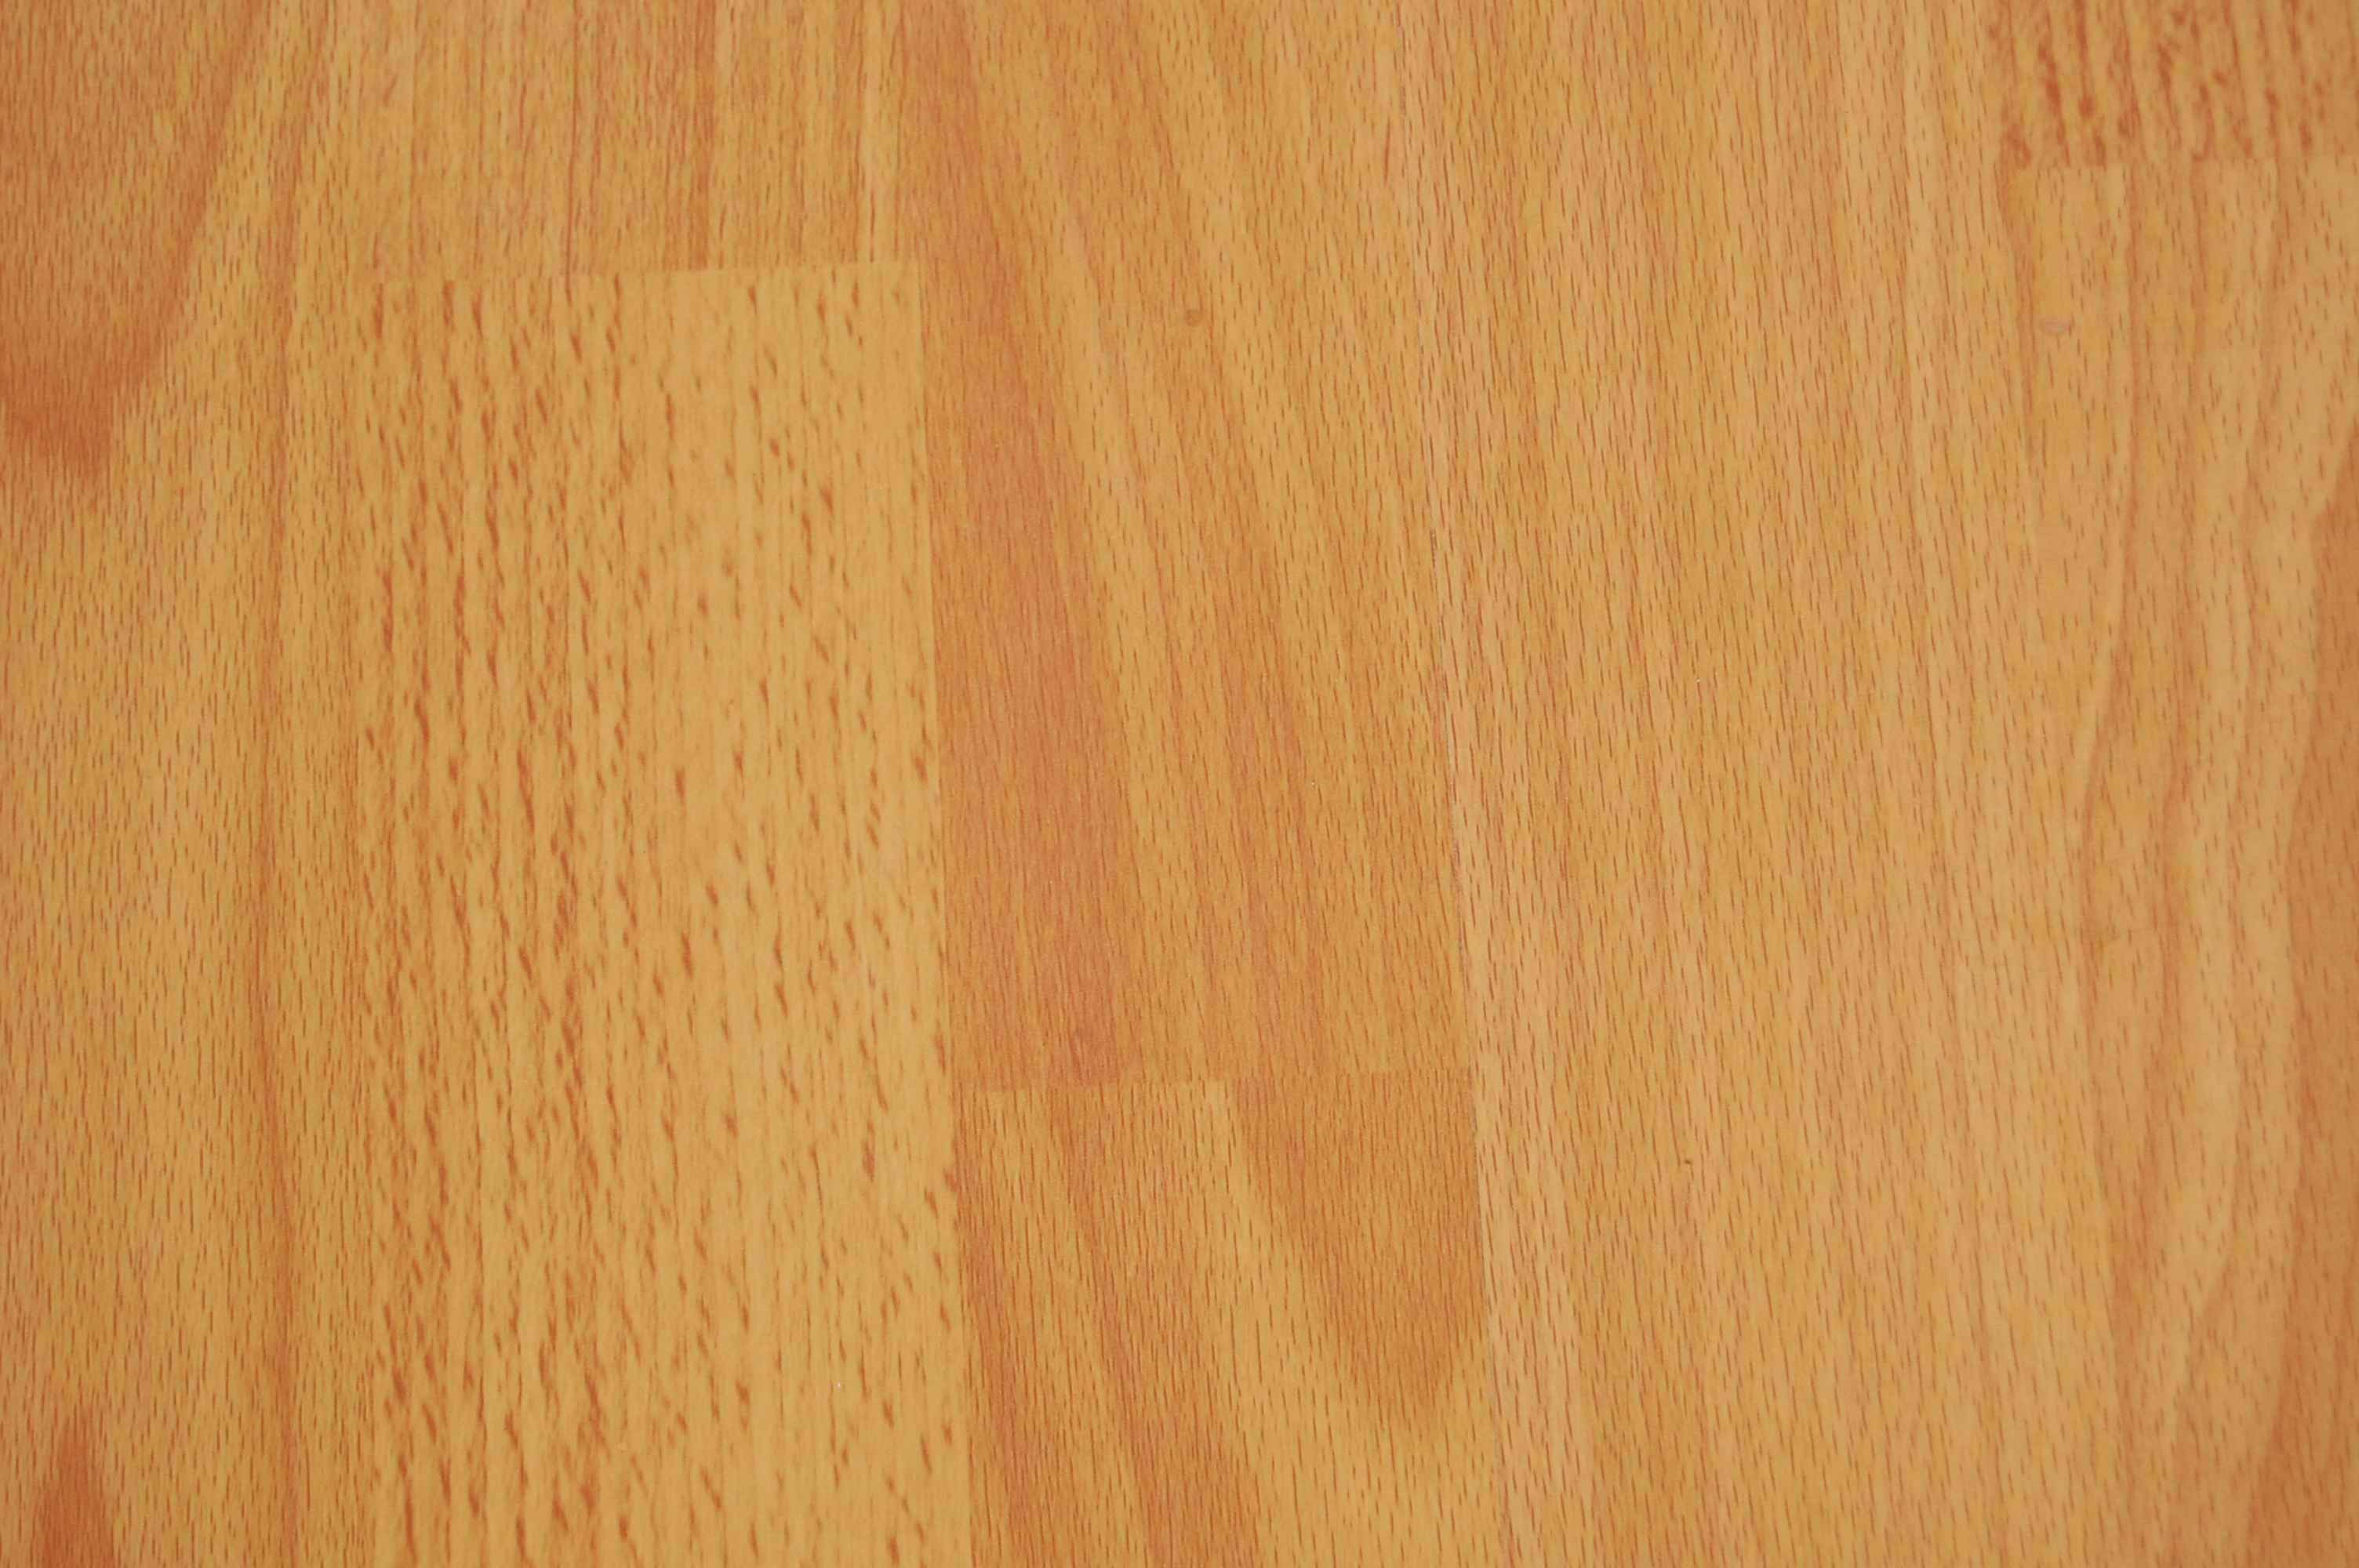 laminated wooden flooring photo - 1